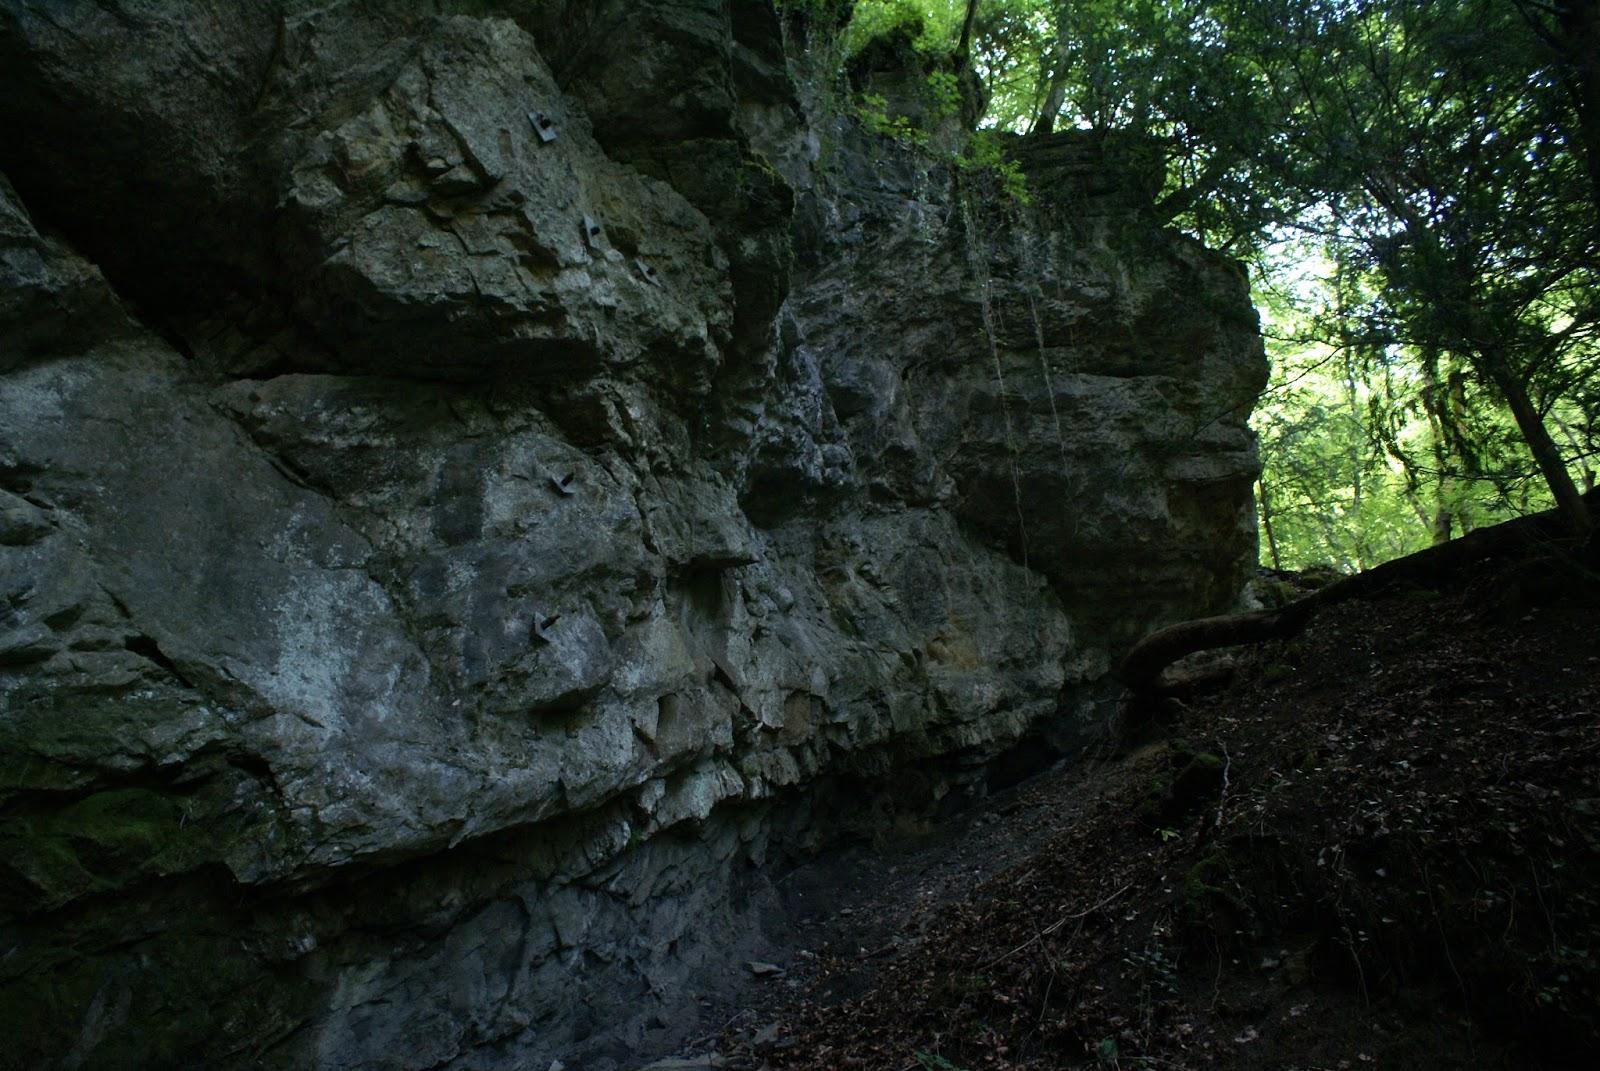 seythenex cascade grotte cave waterfall savoie mont blanc france alpes alps